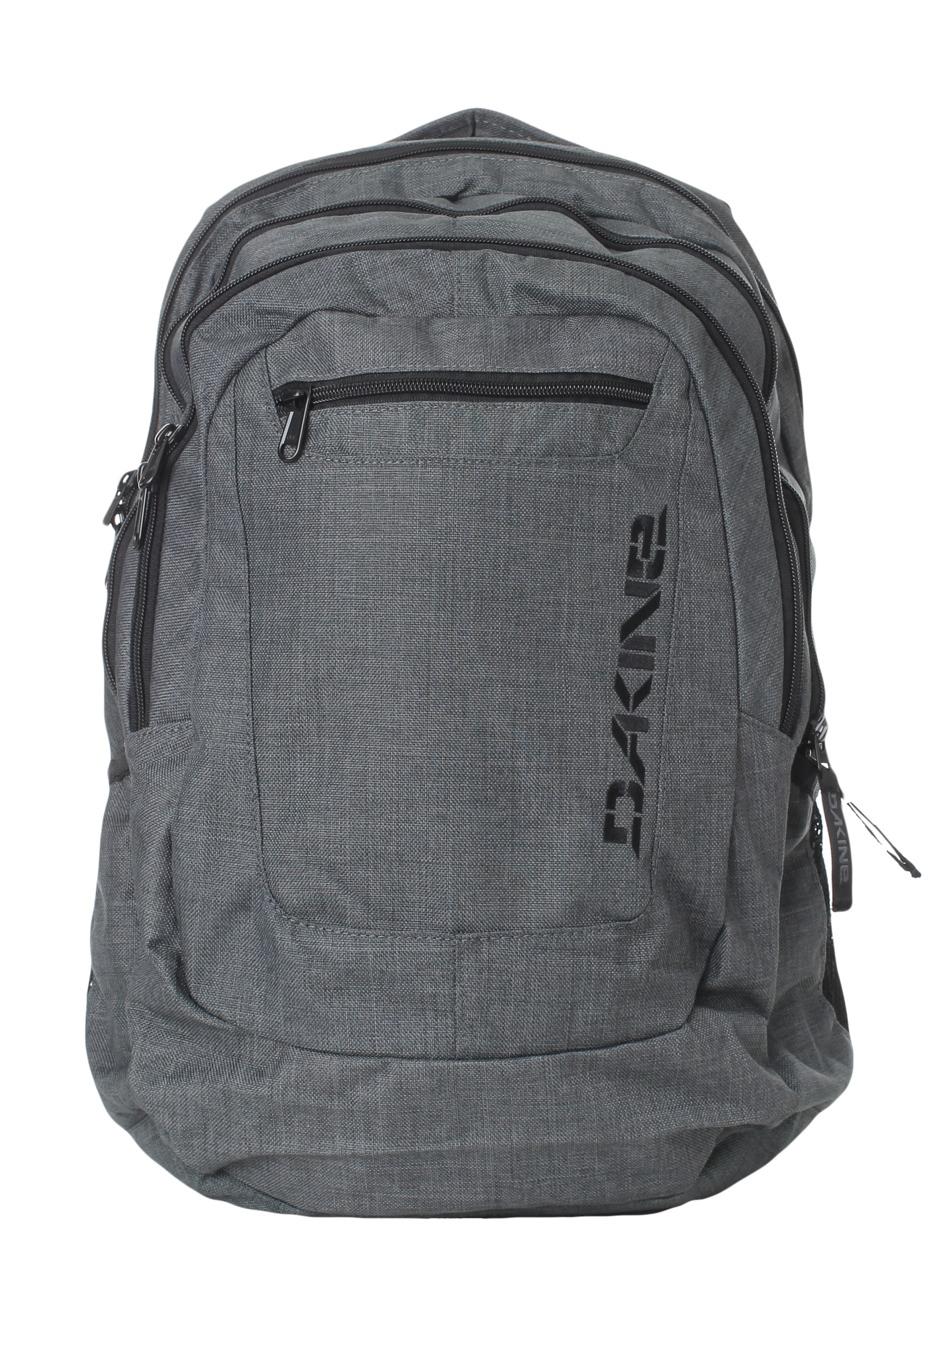 Dakine - Element Carbon - Backpack - Impericon.com Worldwide